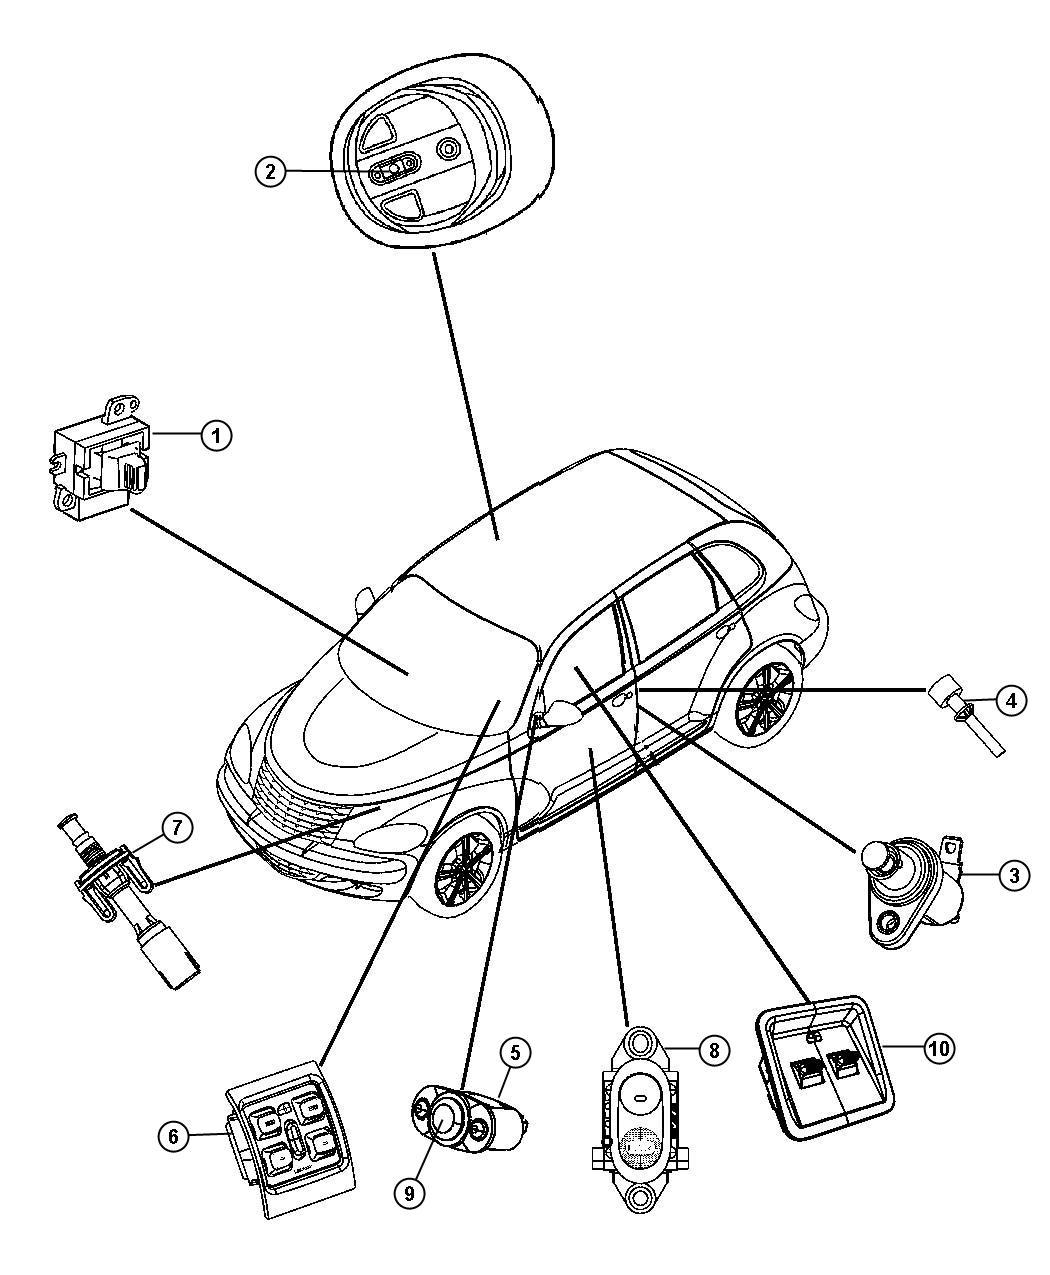 2008 Chrysler PT Cruiser Switch. 5 gang. Trim: [all trim